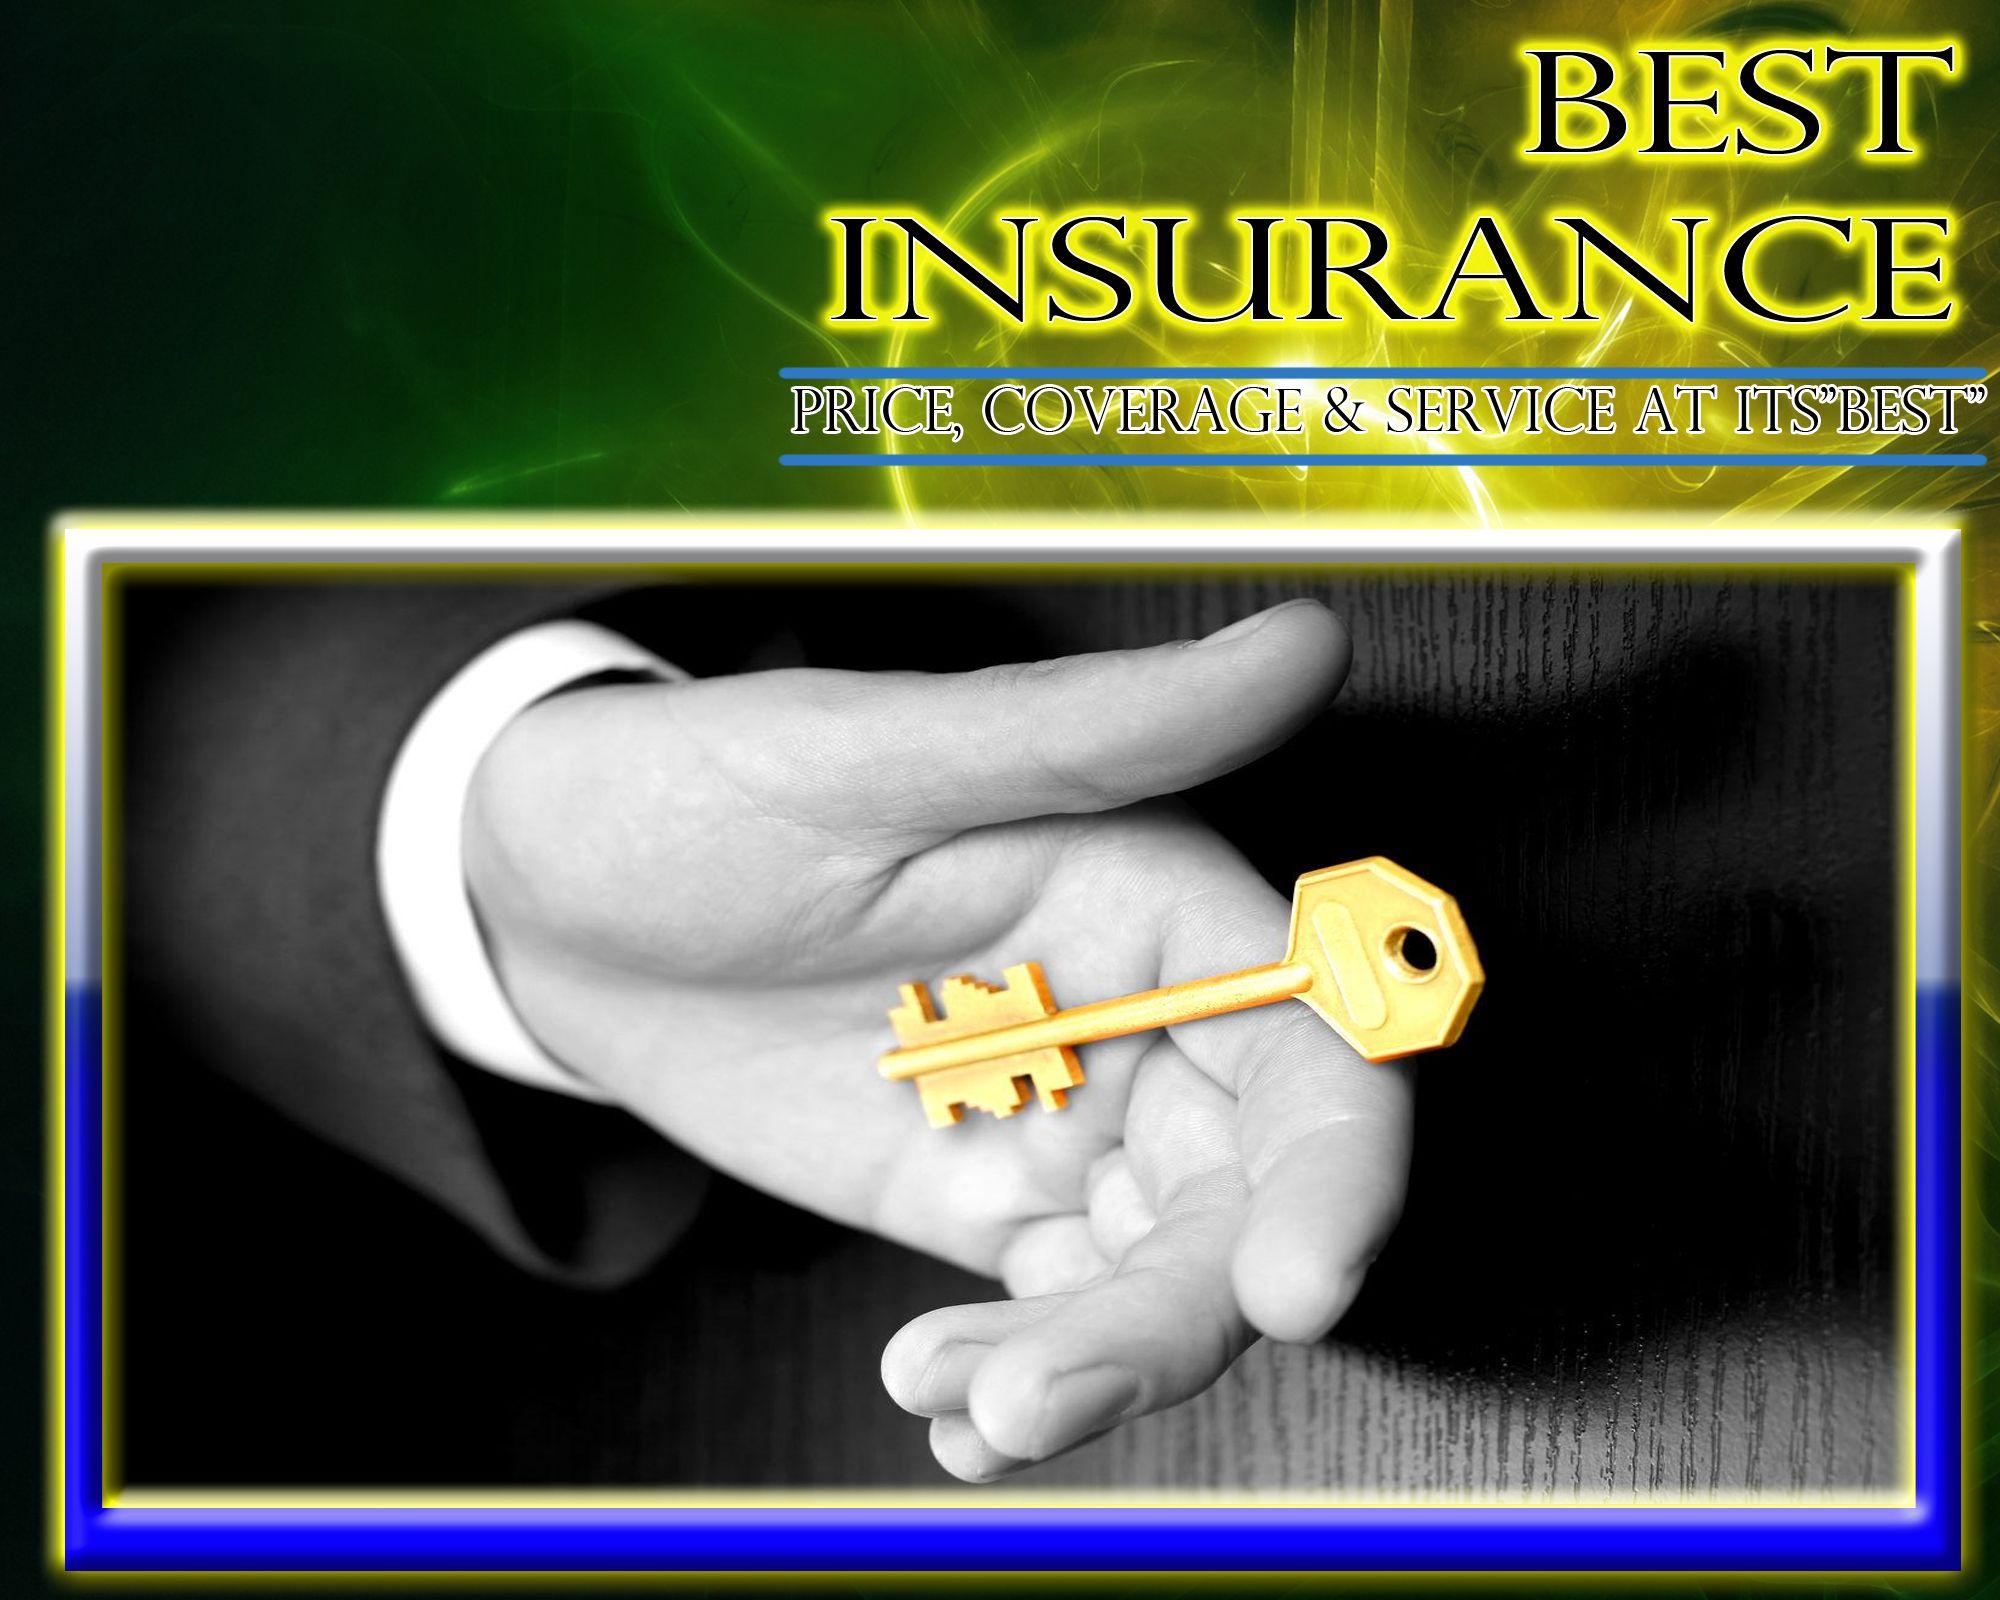 Automobileinsuranceftlauderdale key kerson insurance